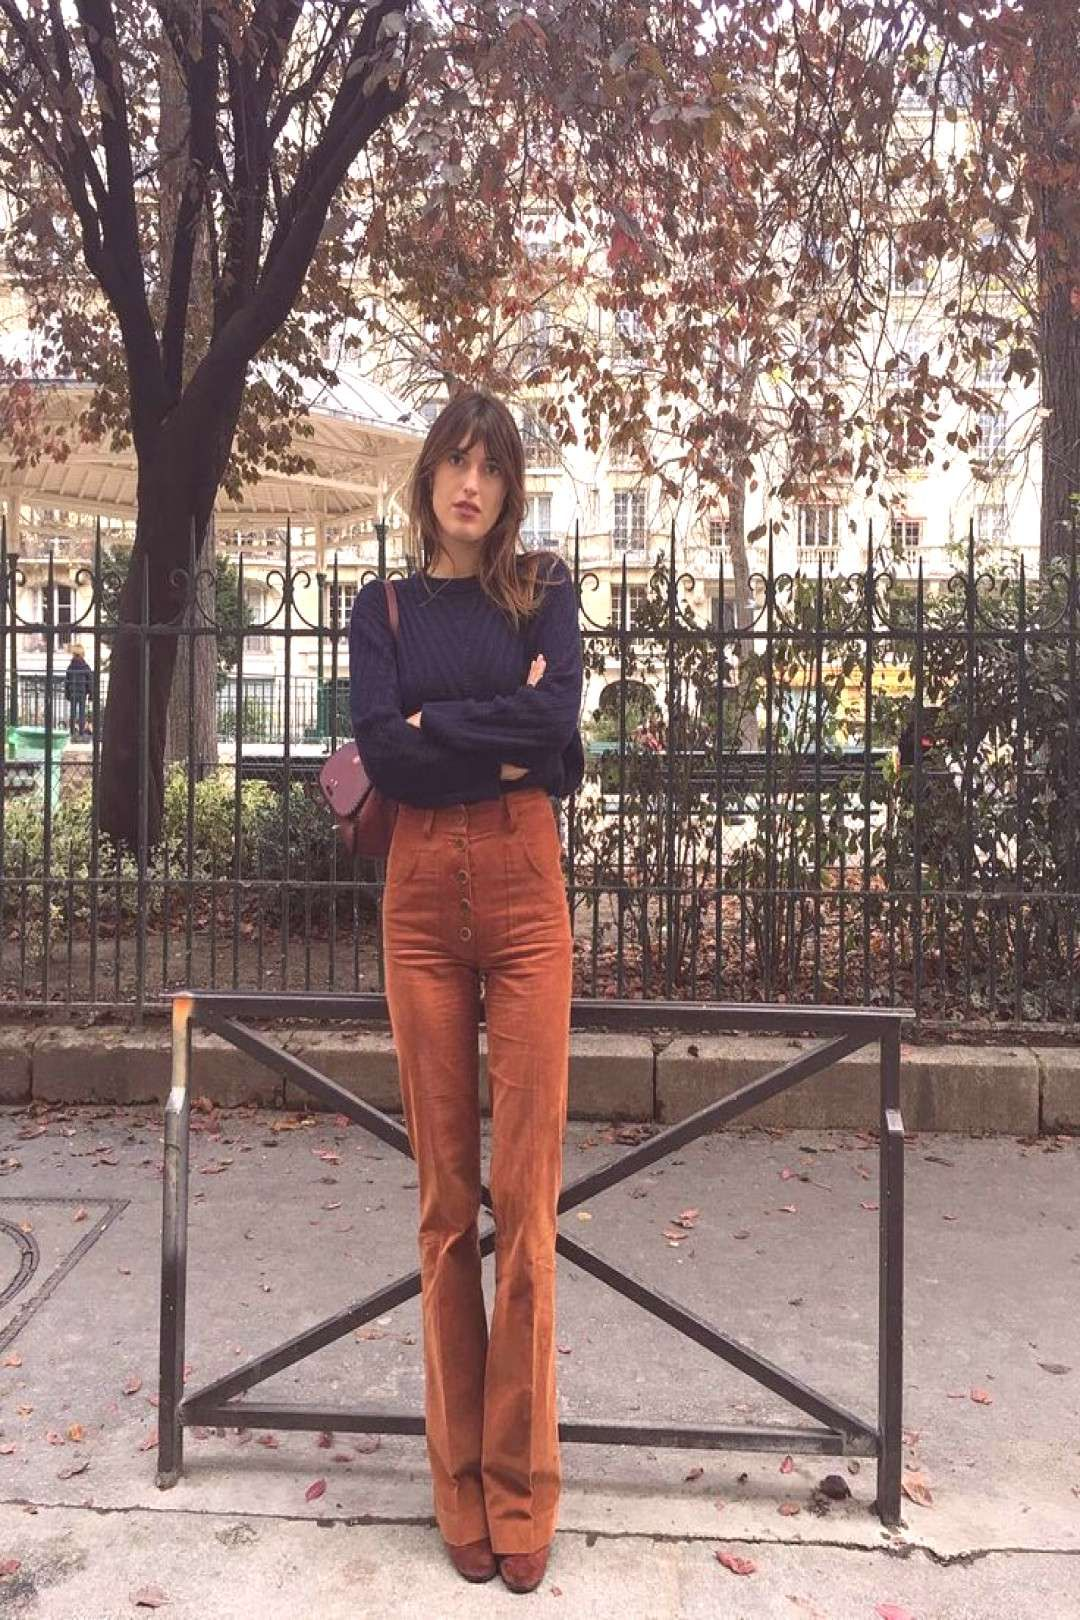 #fotodemoda #resultado #imagen #jeanne #damas #disco #para #soho #de Resultado de imagen para jeanne damas soho disco,  ... Resultado de imagen para jeanne damas soho dYou can find Soh...